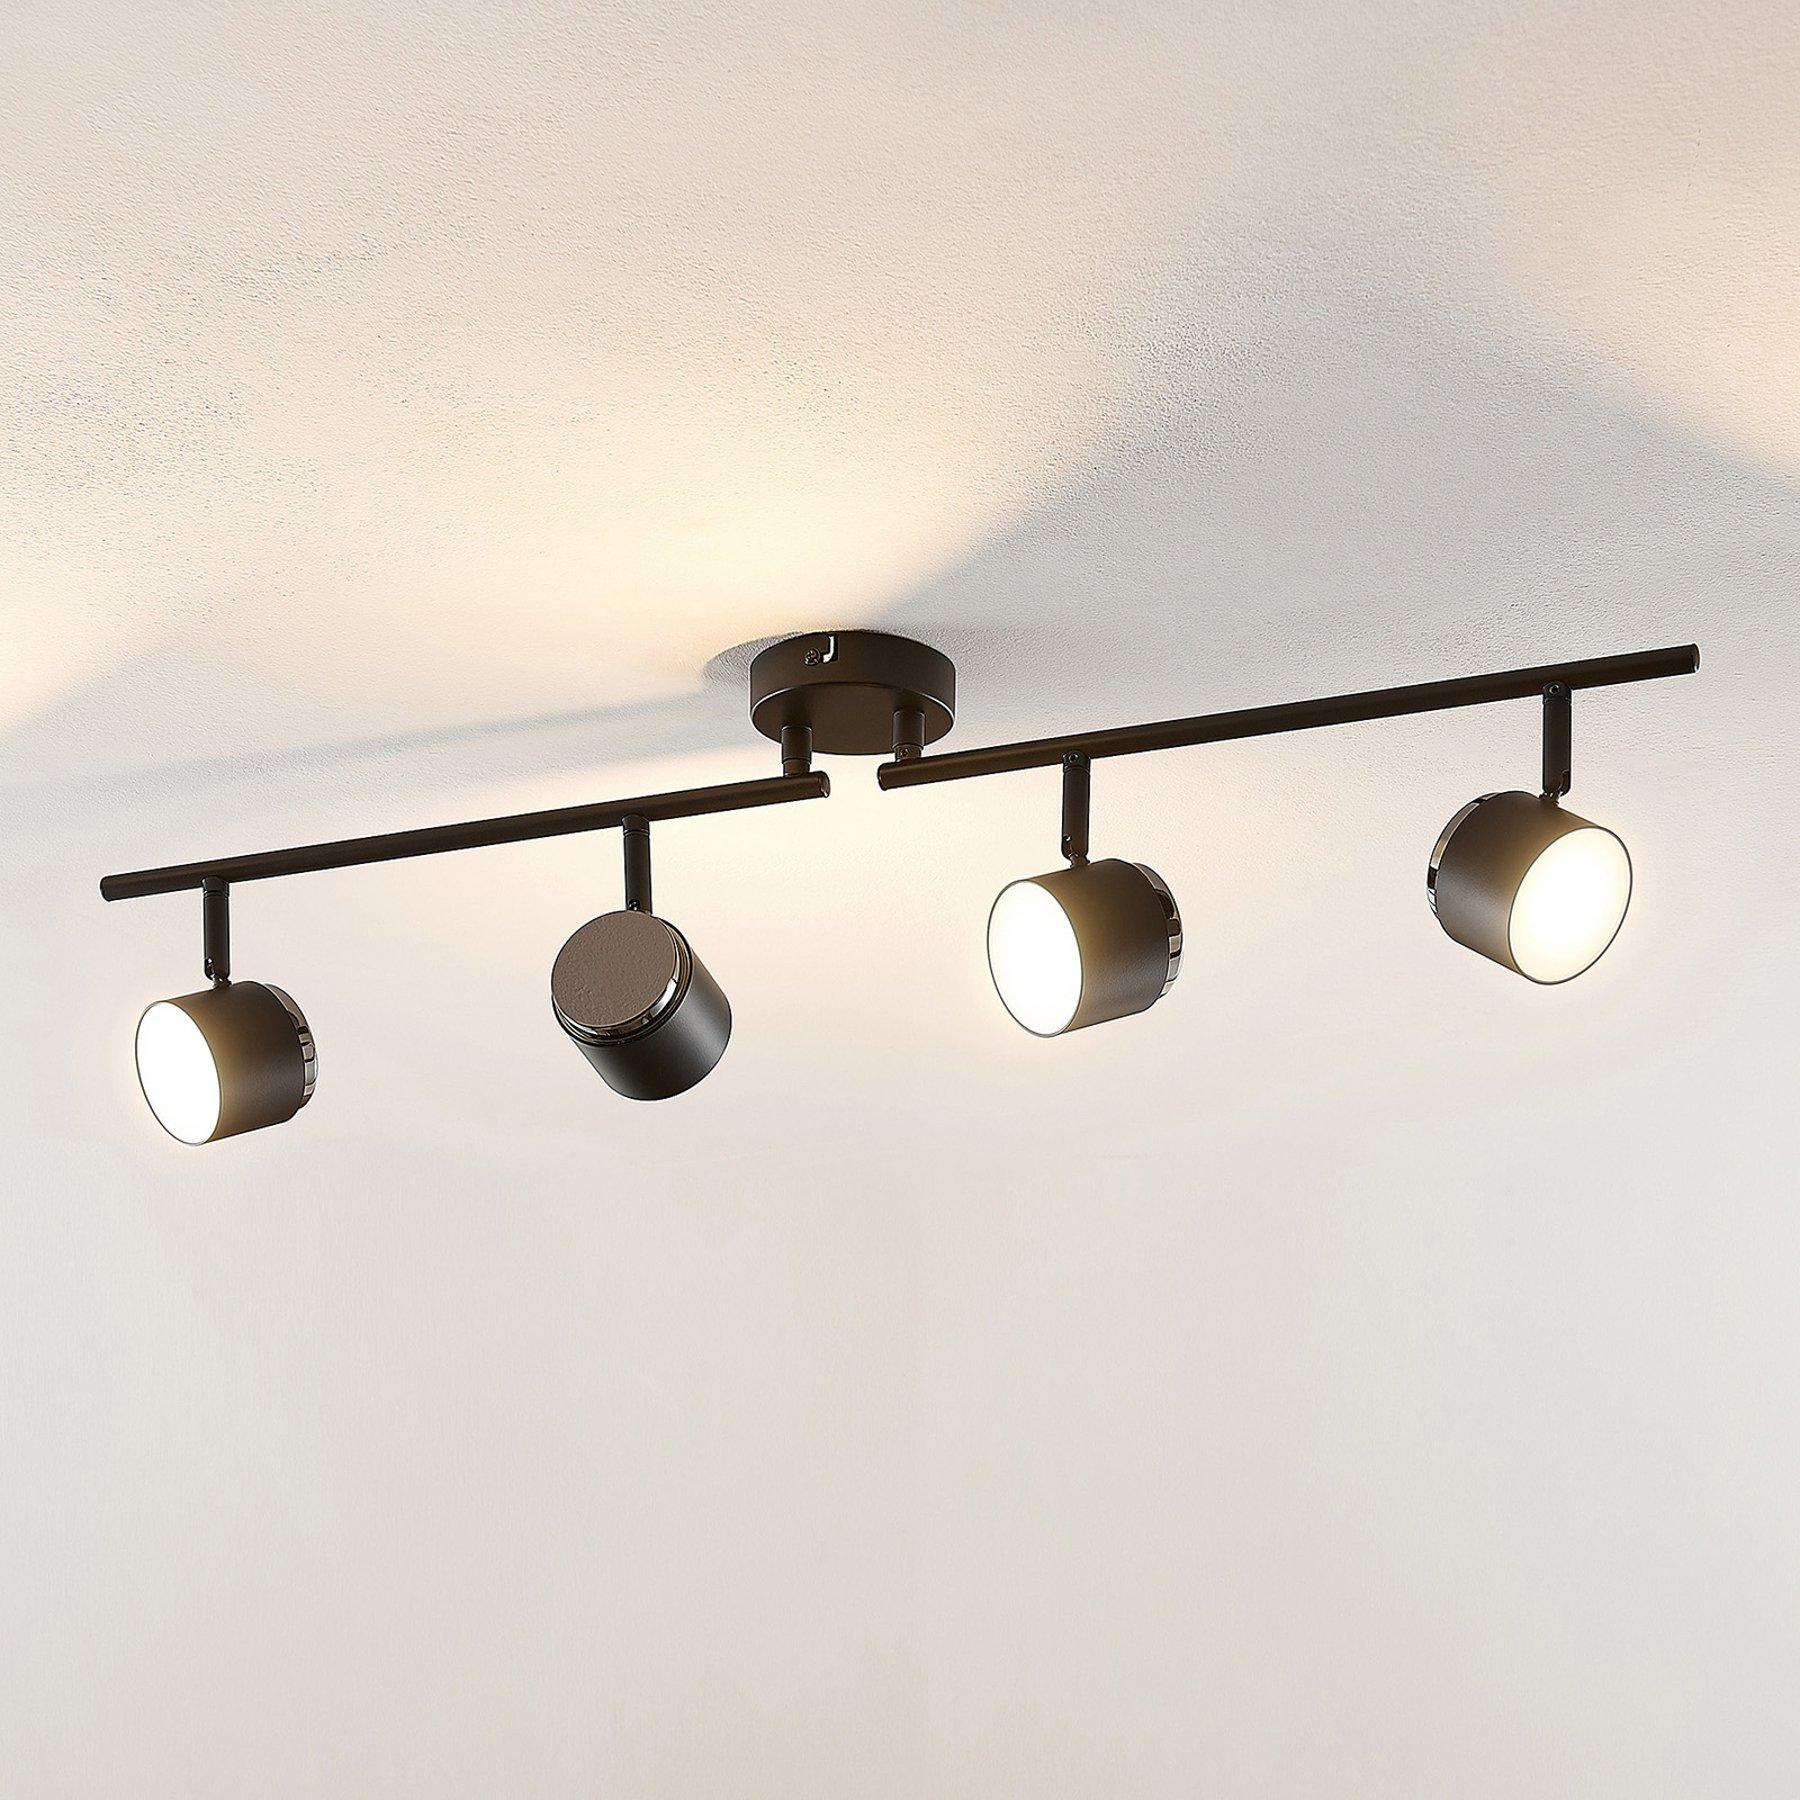 Lindby Marrie LED-lyskaster, svart, 4 lyskilder